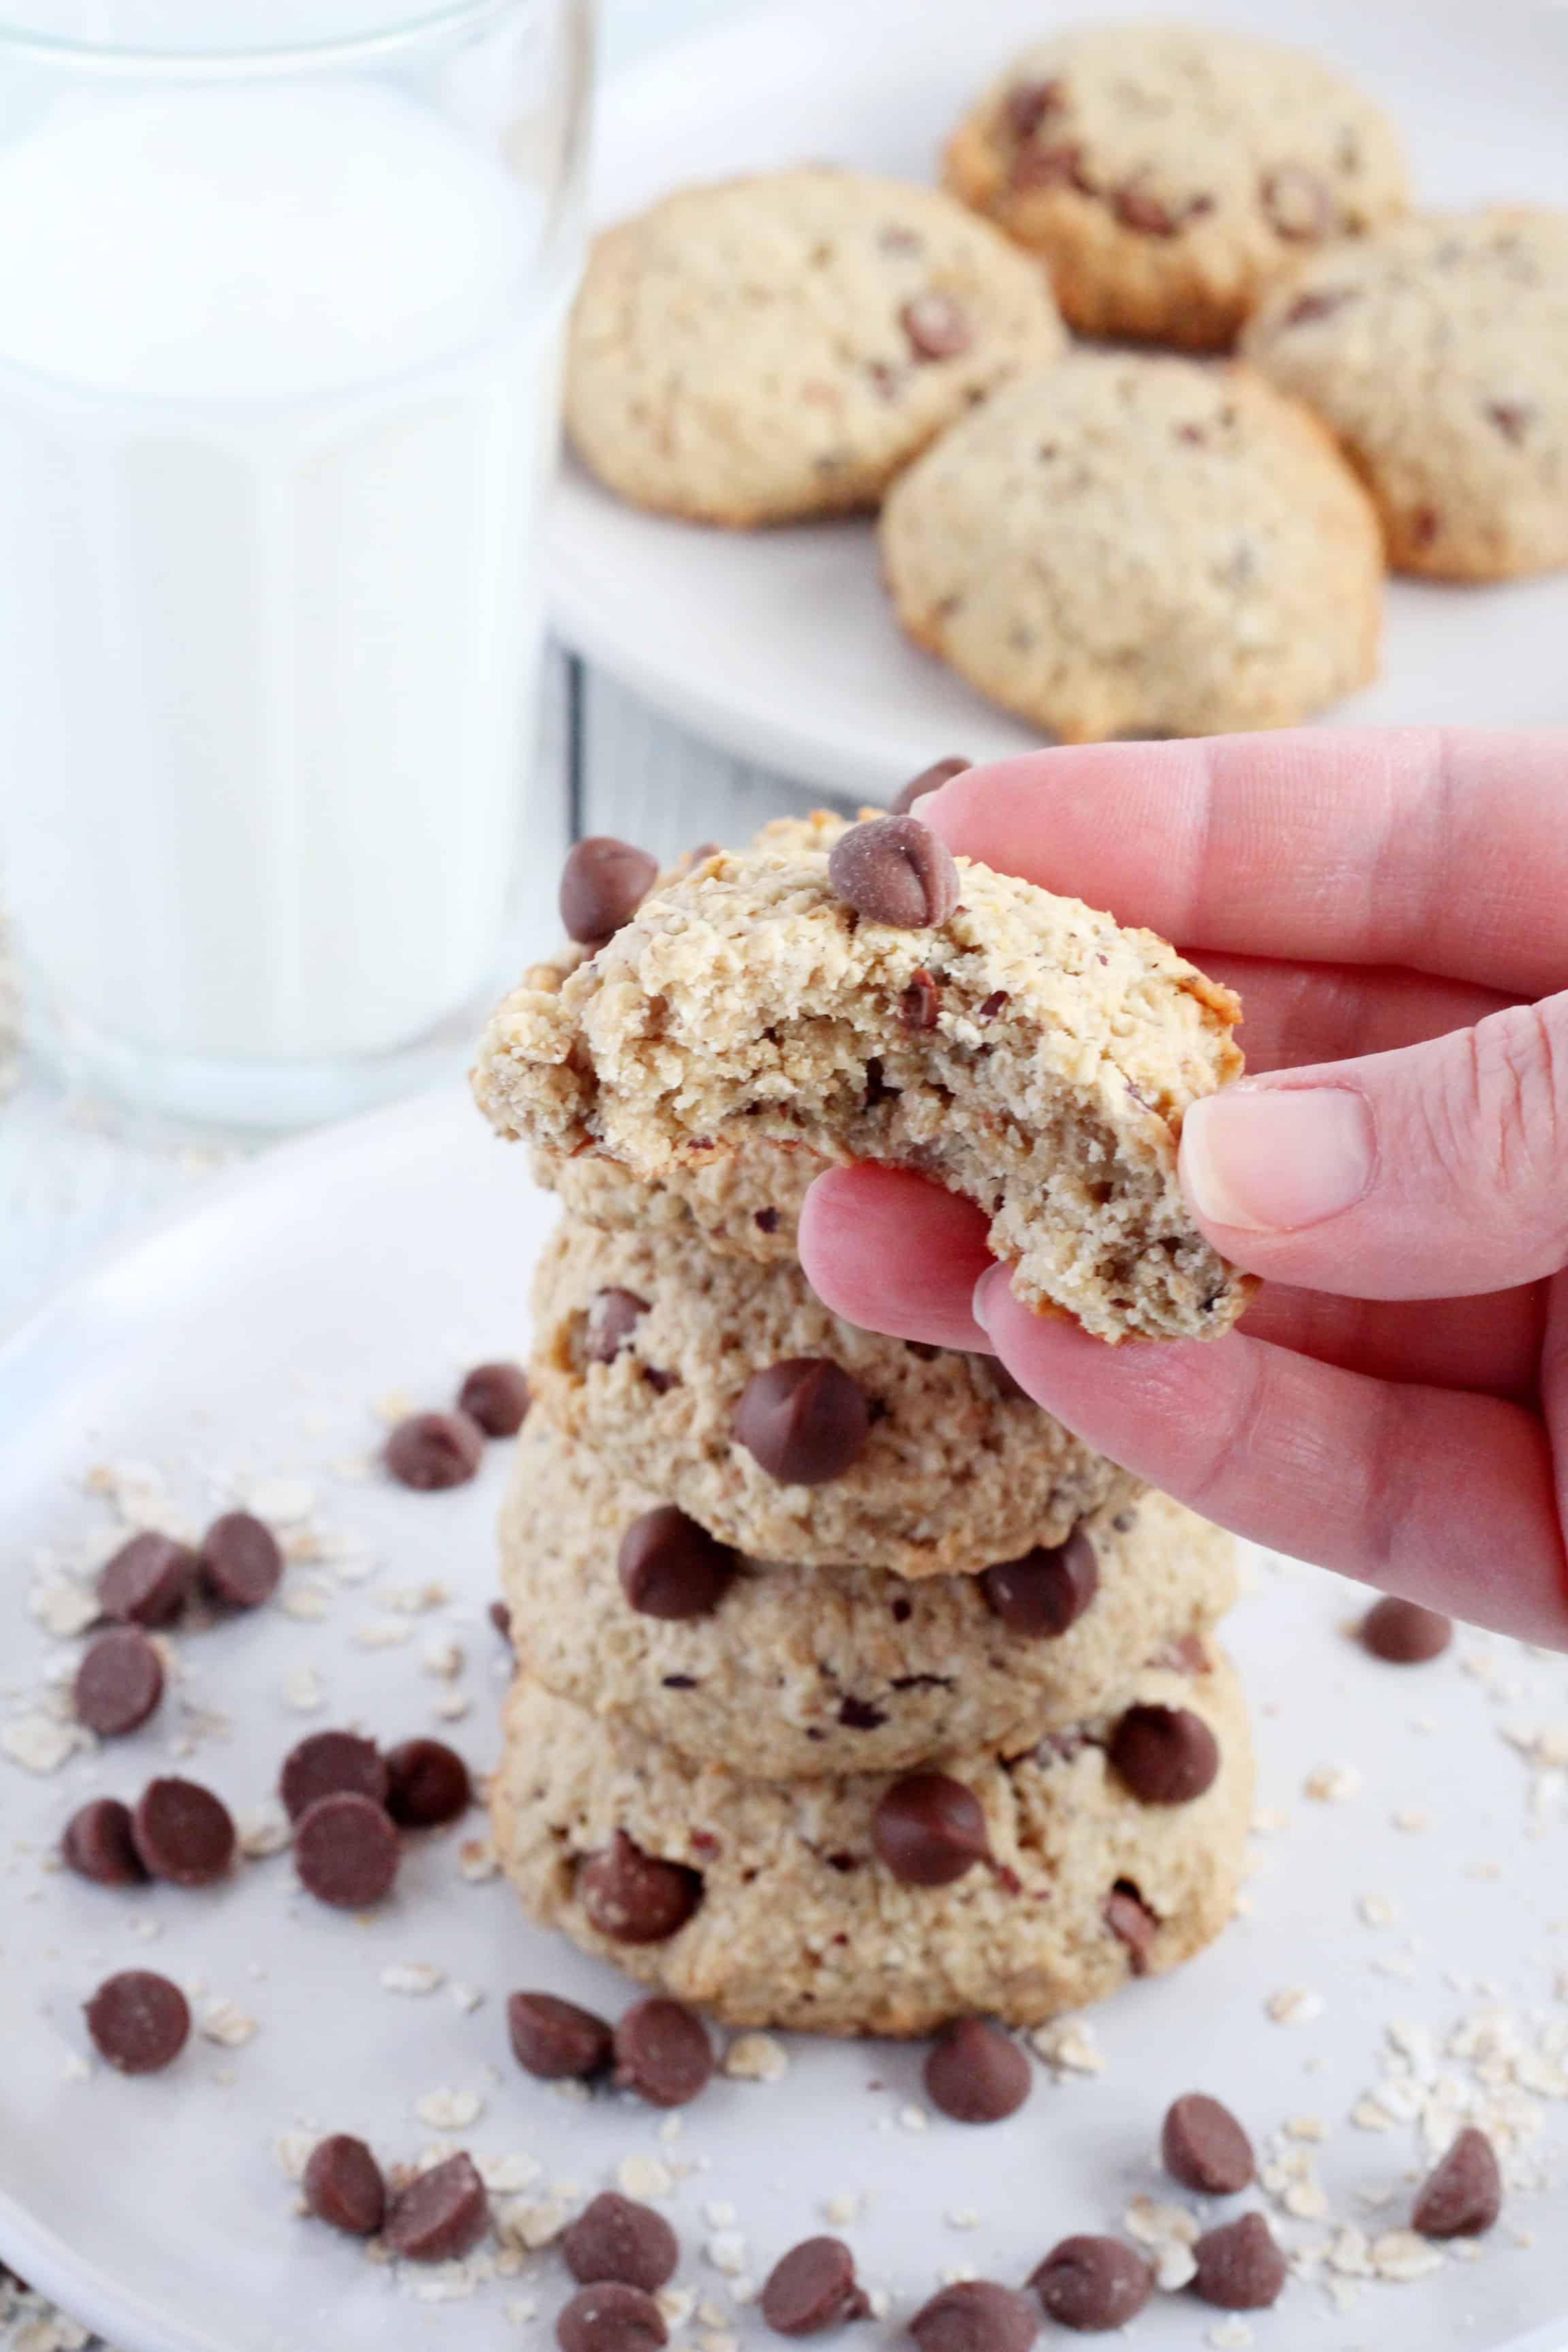 Oatmeal cookies gluten free